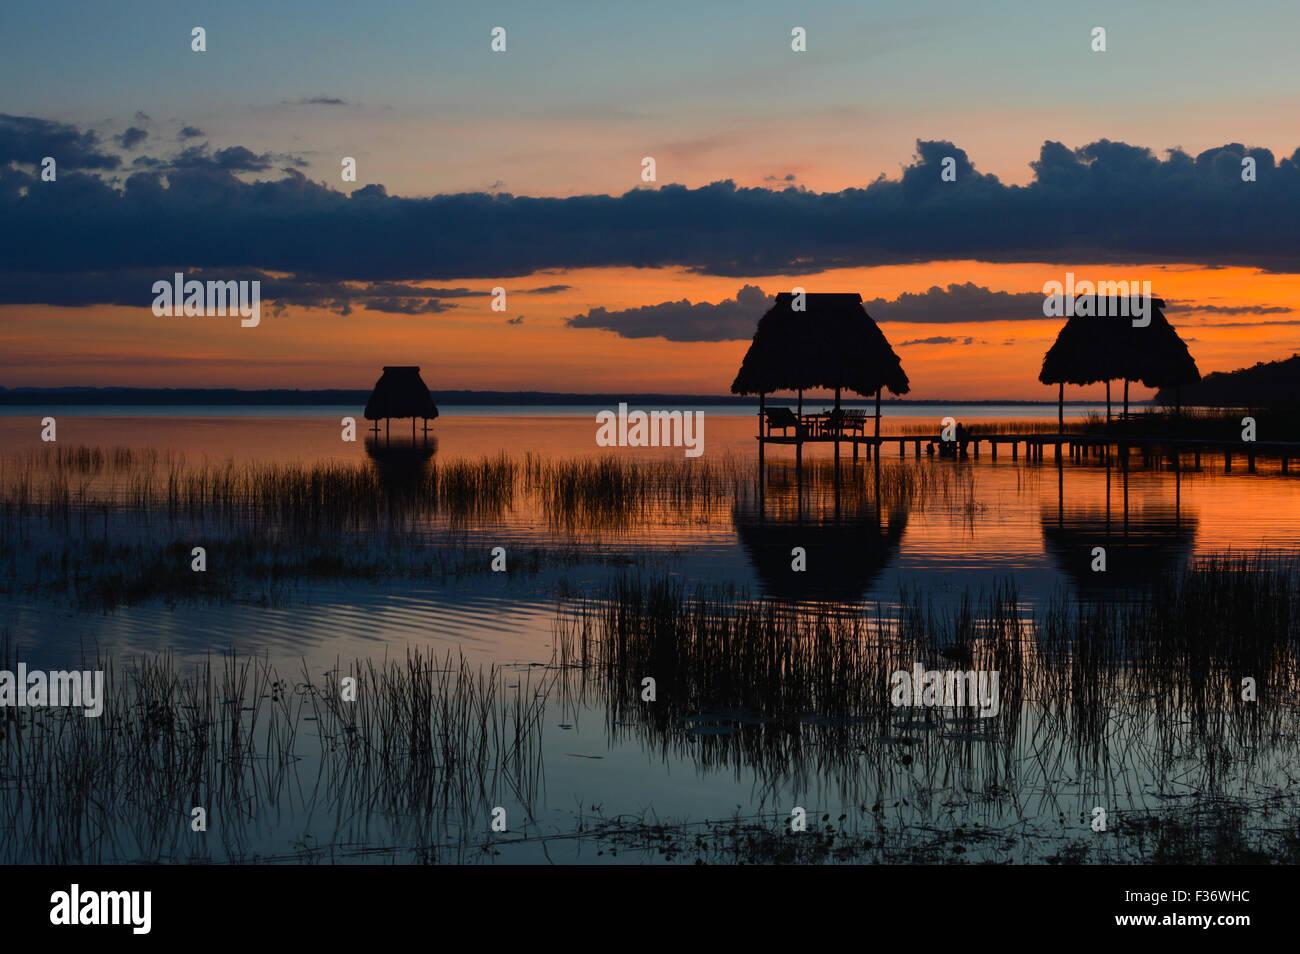 Sunset at the lake Peten Itza in El Ramate, Guatemala Stock Photo